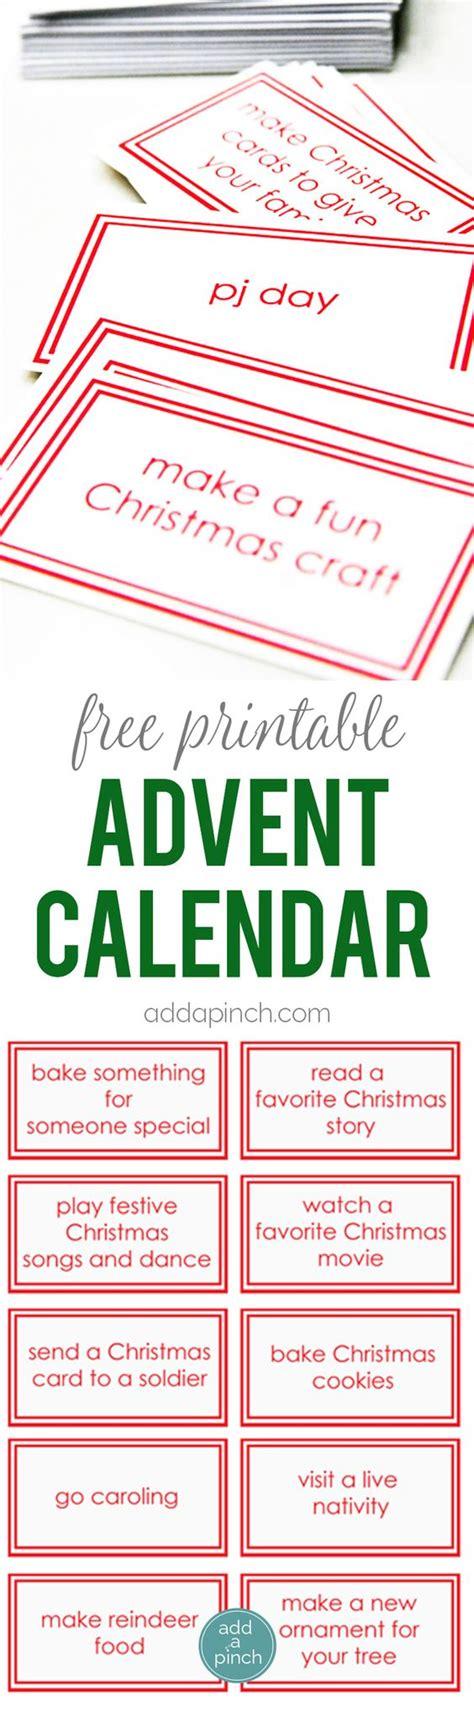 printable advent calendar pinterest advent calendar calendar printable and advent on pinterest